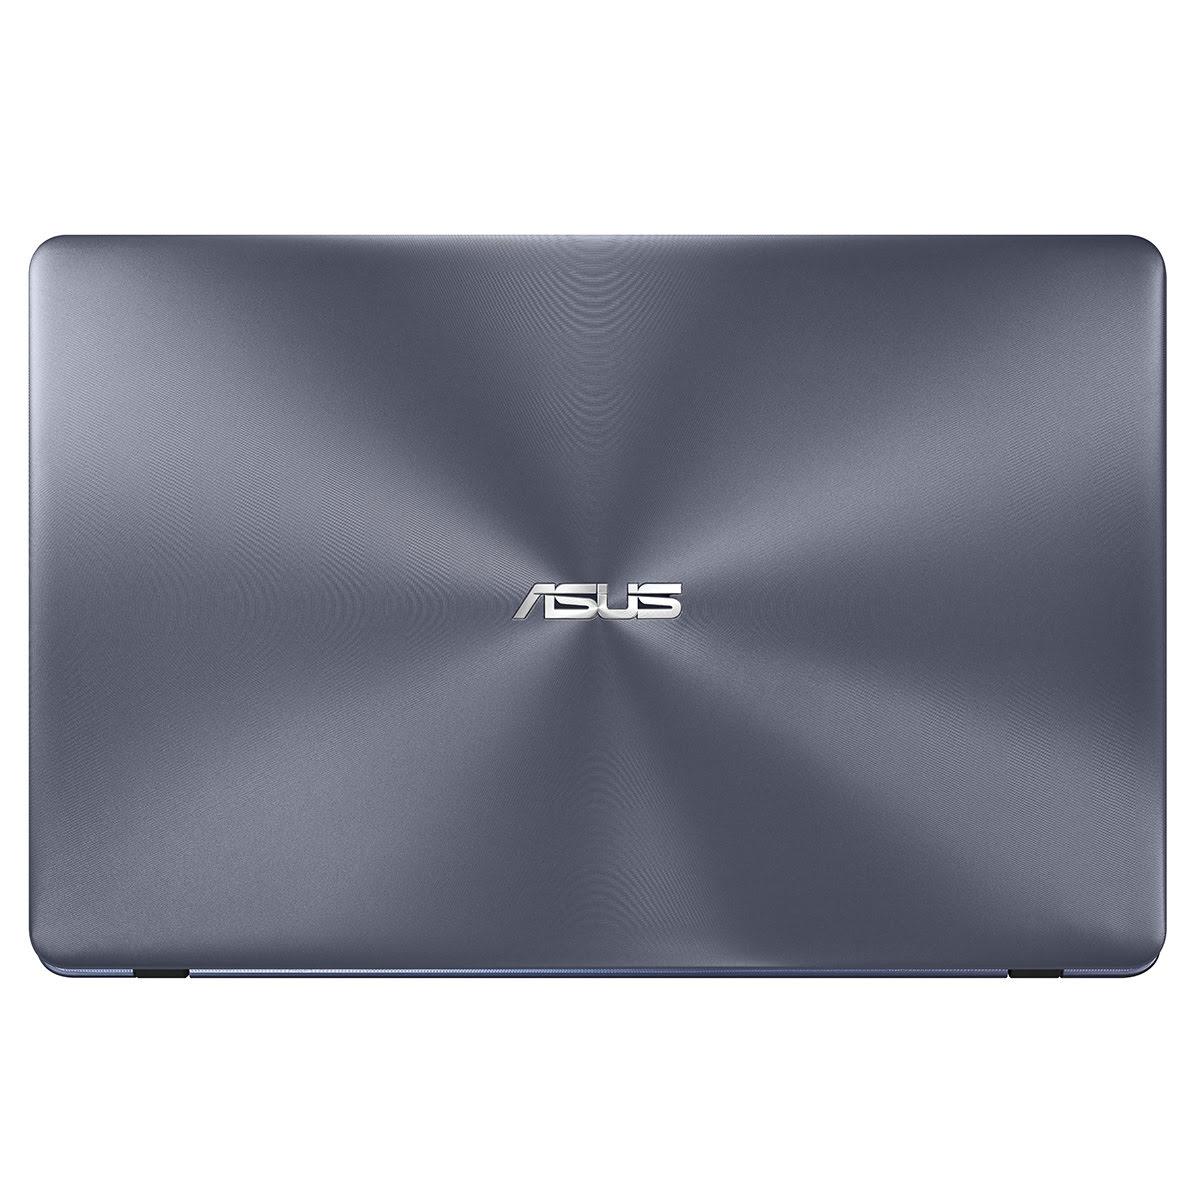 Asus 90NB0IE1-M01500 - PC portable Asus - Cybertek.fr - 2